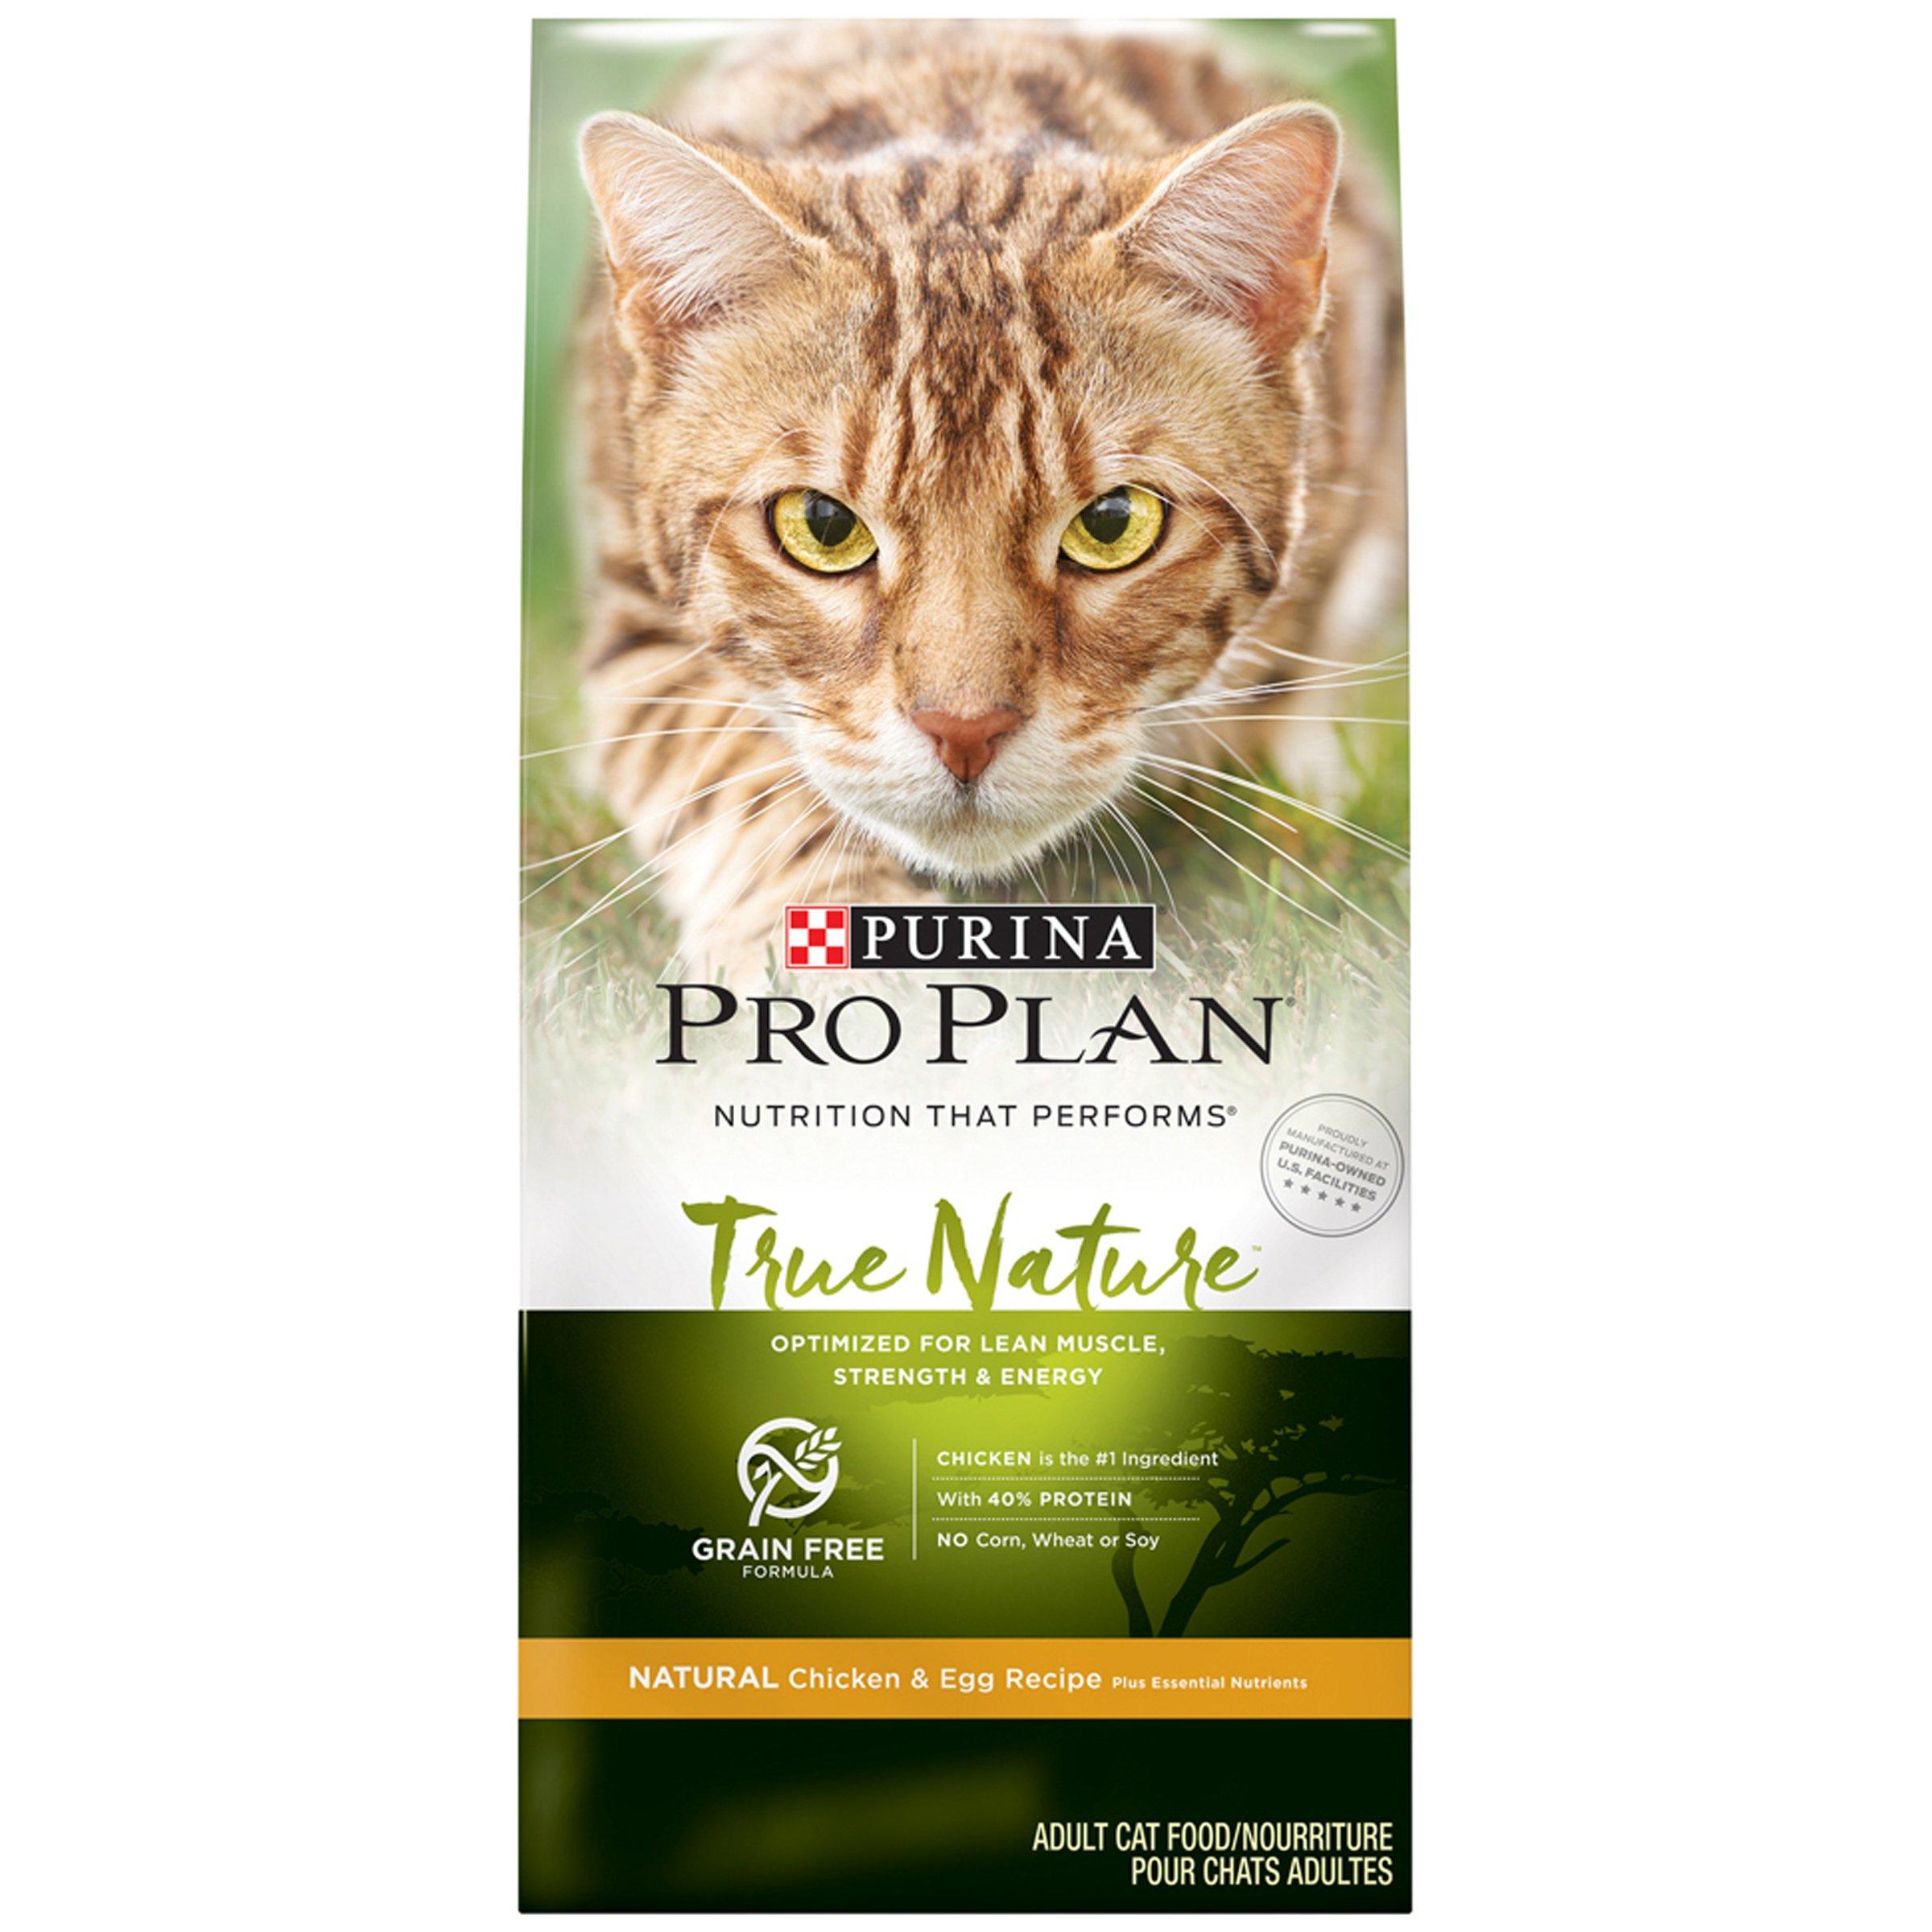 Purina Pro Plan TRUE NATURE Adult Grain Free Formula Natural Chicken & Egg Recipe Adult Dry Food - (1) 6 lb. Bag